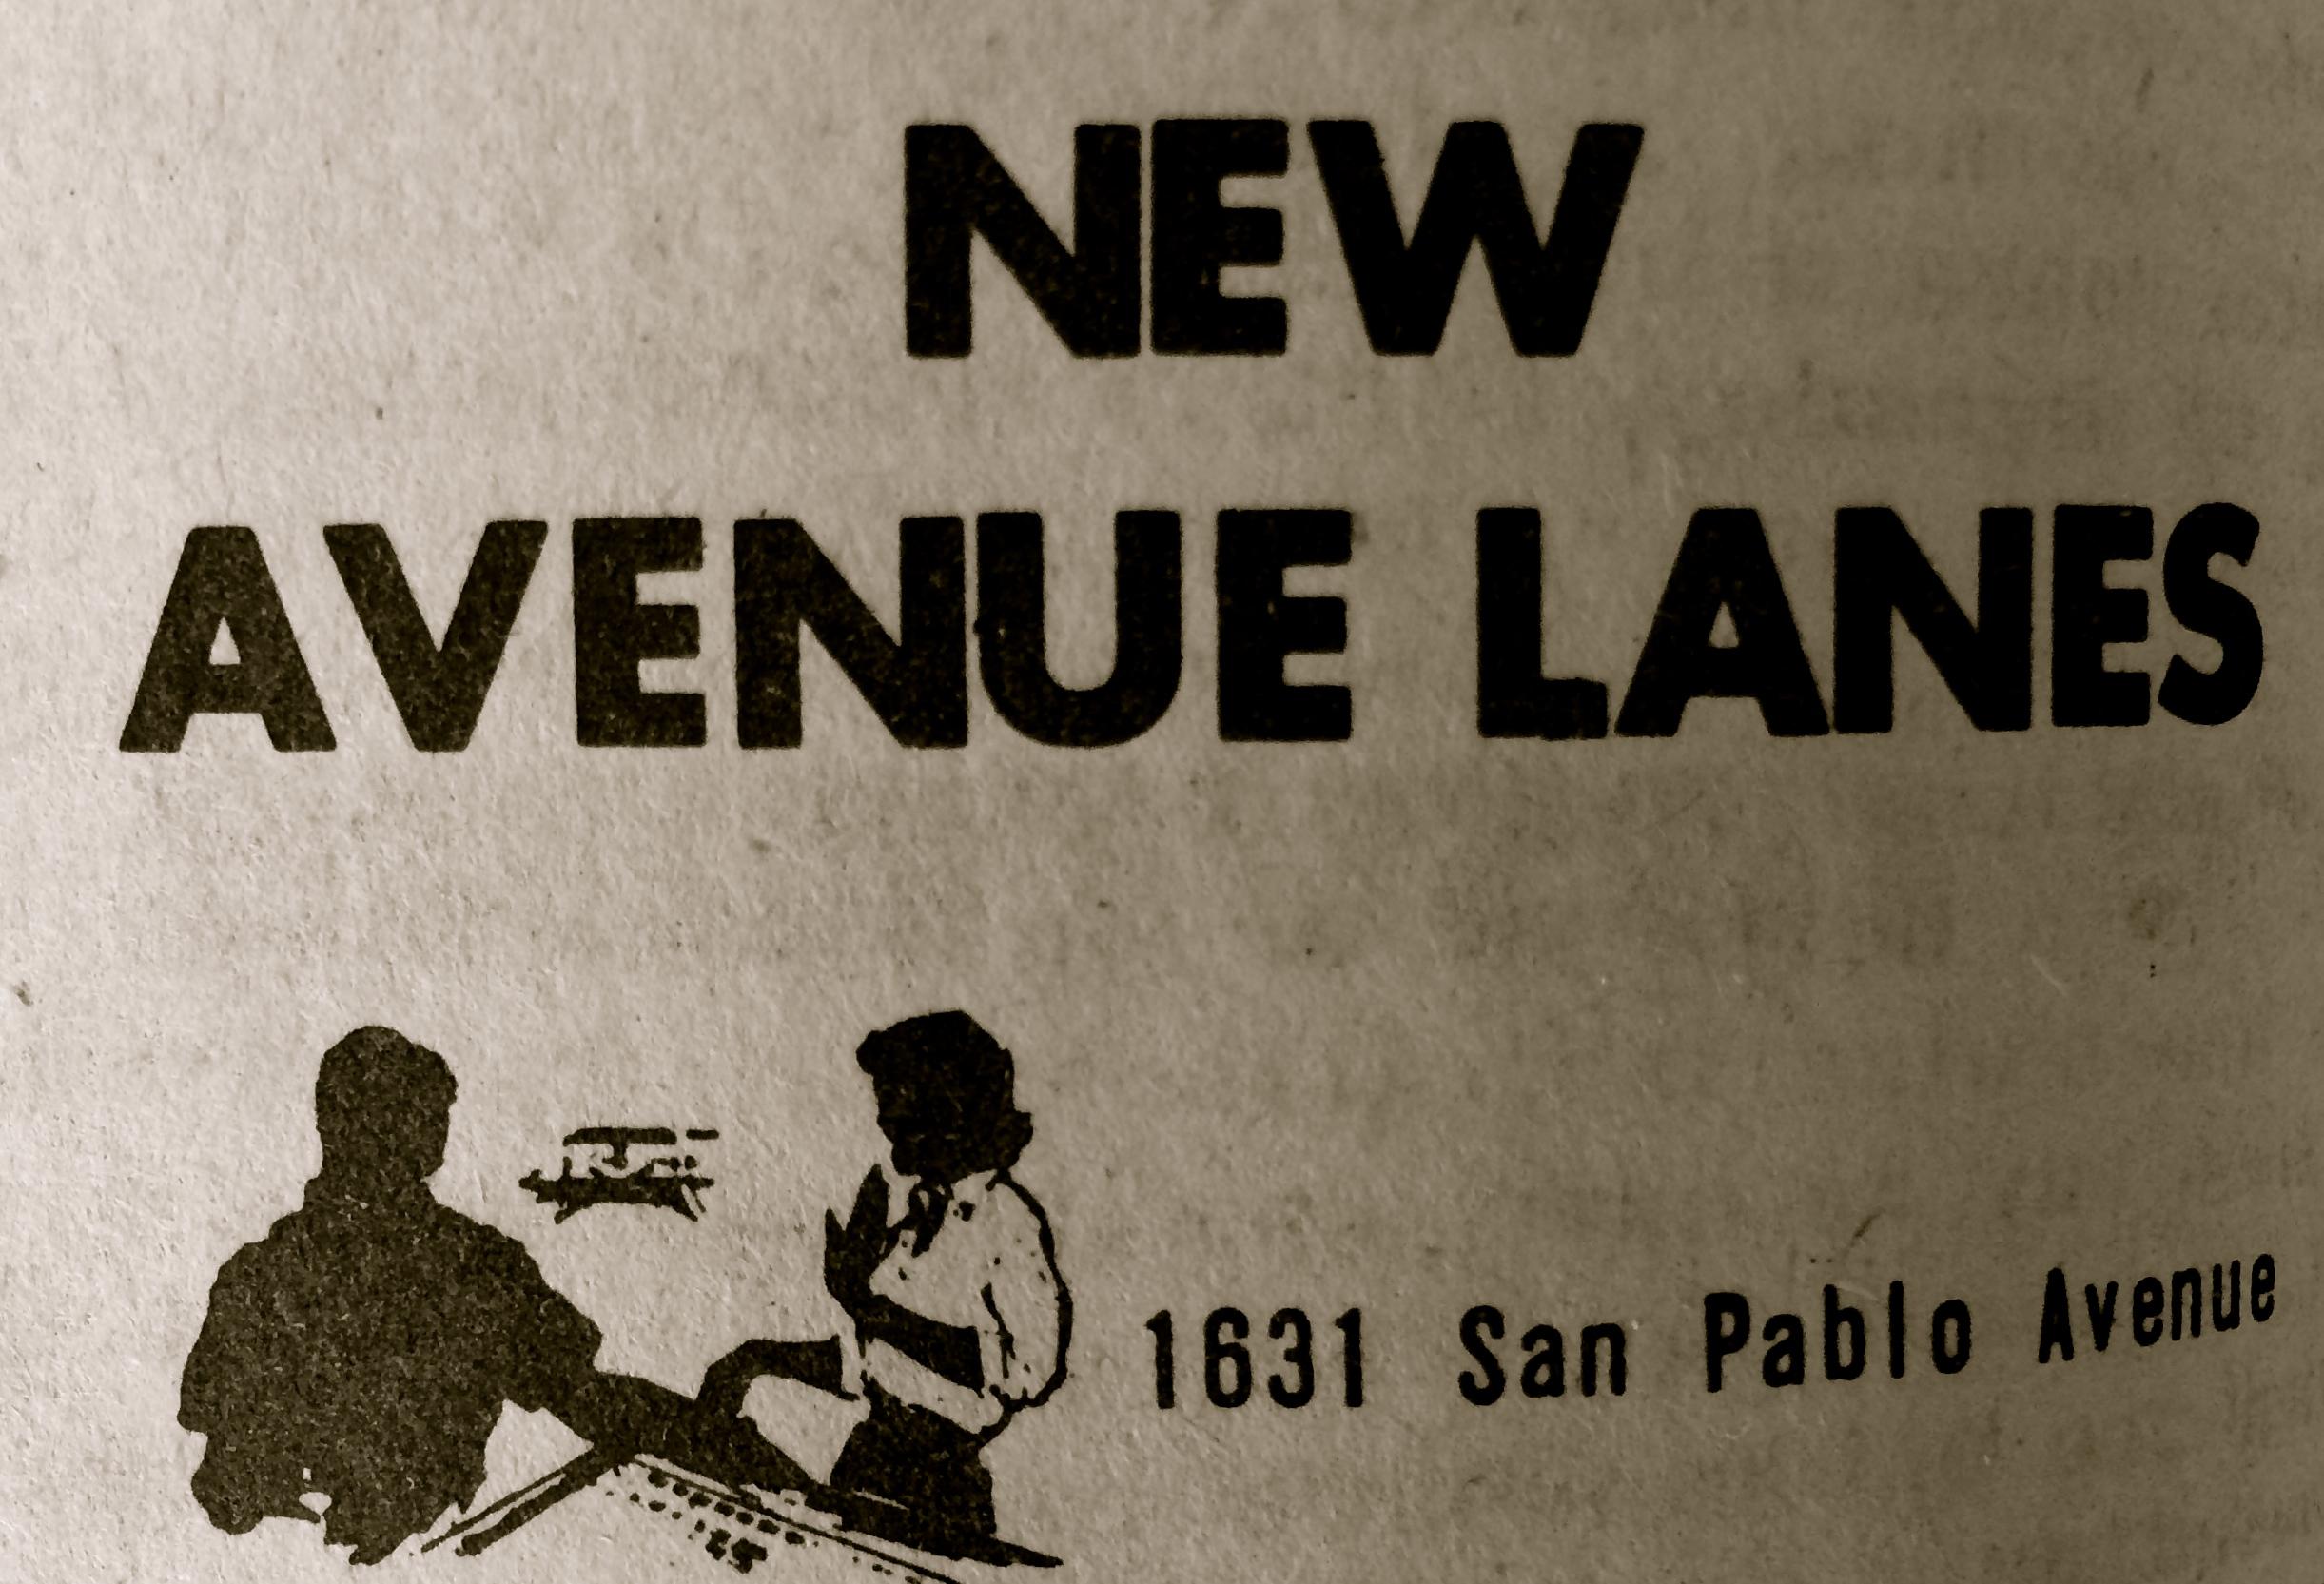 New Avenue Lanes, 1631 San Pablo